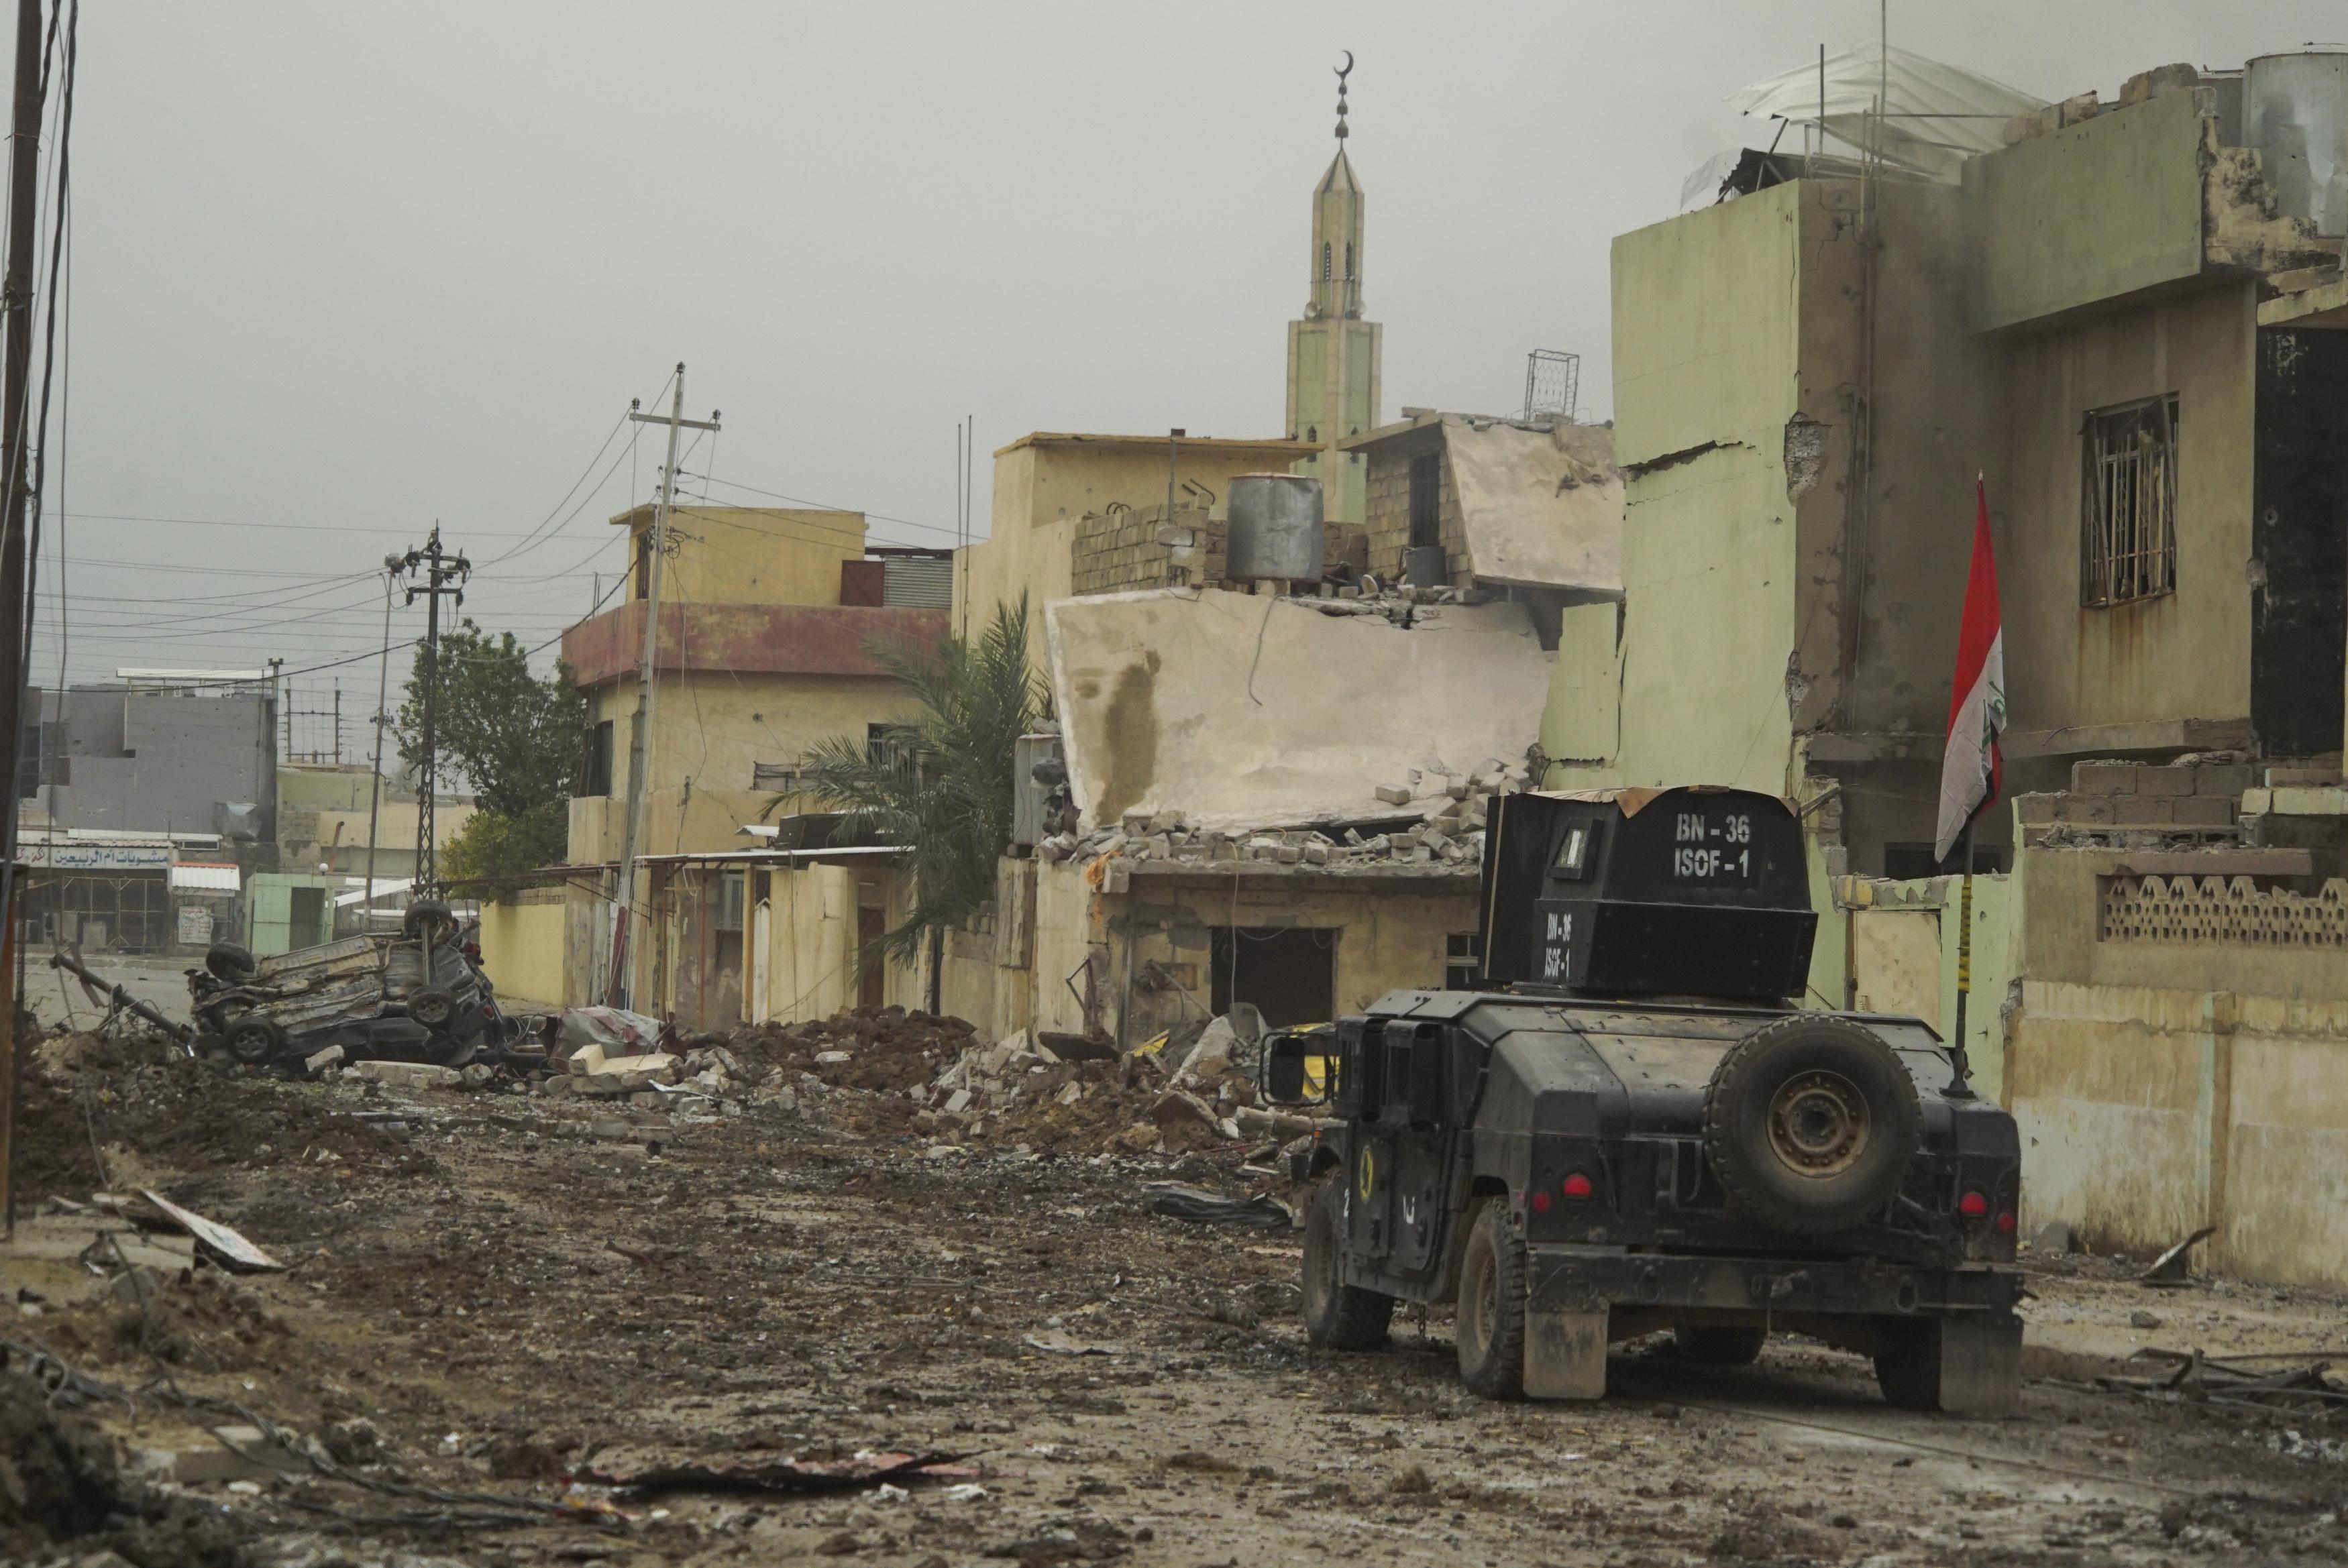 File:ISOF APC on the street of Mosul, Northern Iraq, Western Asia. 16 November, 2016.jpg ...